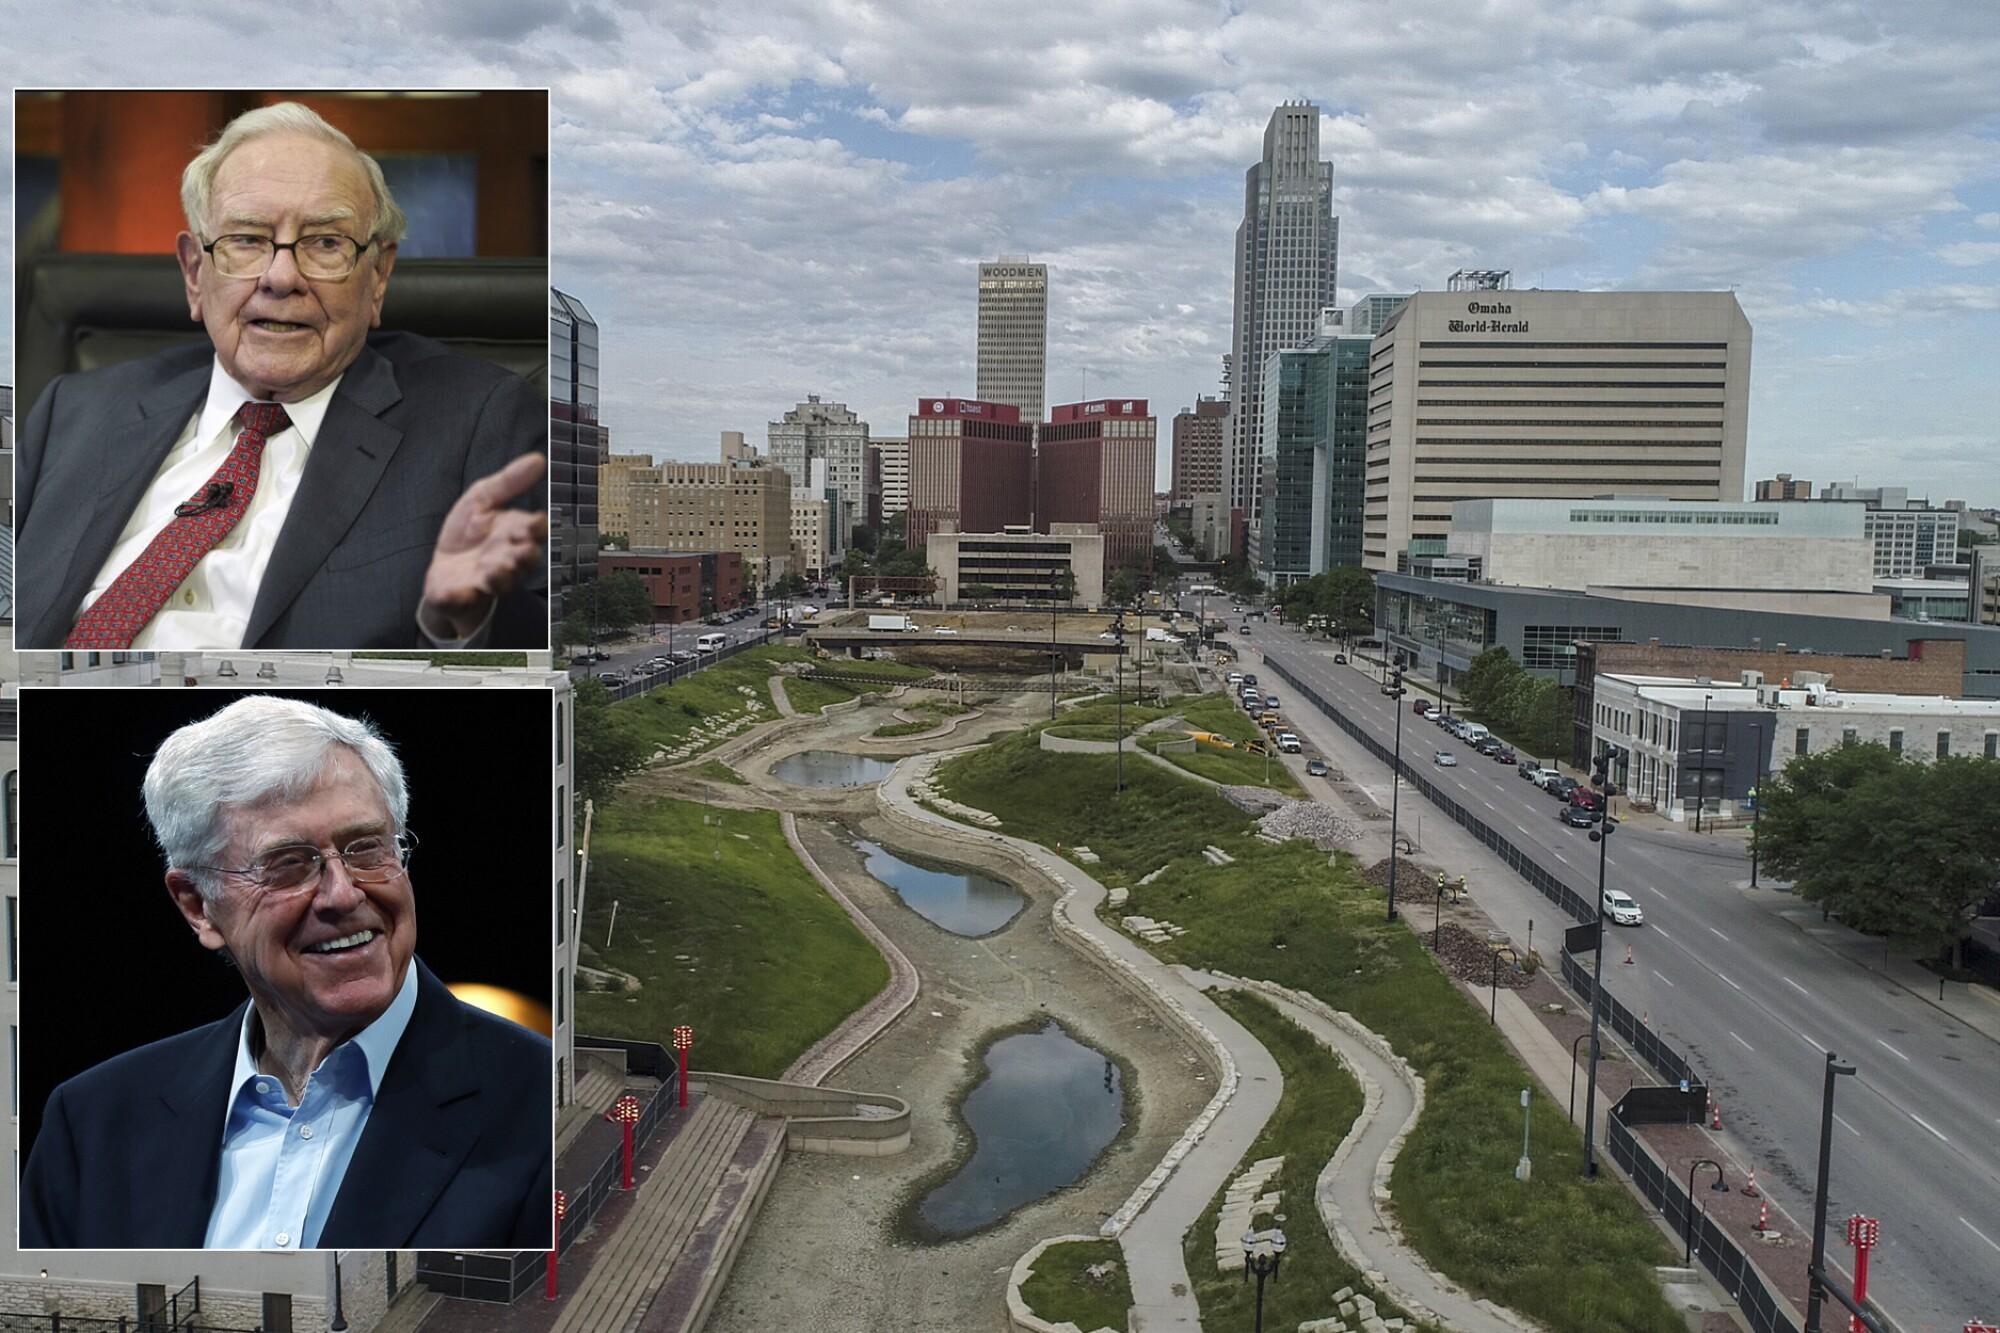 Omaha, shown, is the hometown of Warren Buffett, top inset. Another billionaire, Charles Koch, below, is from Wichita, Kan.